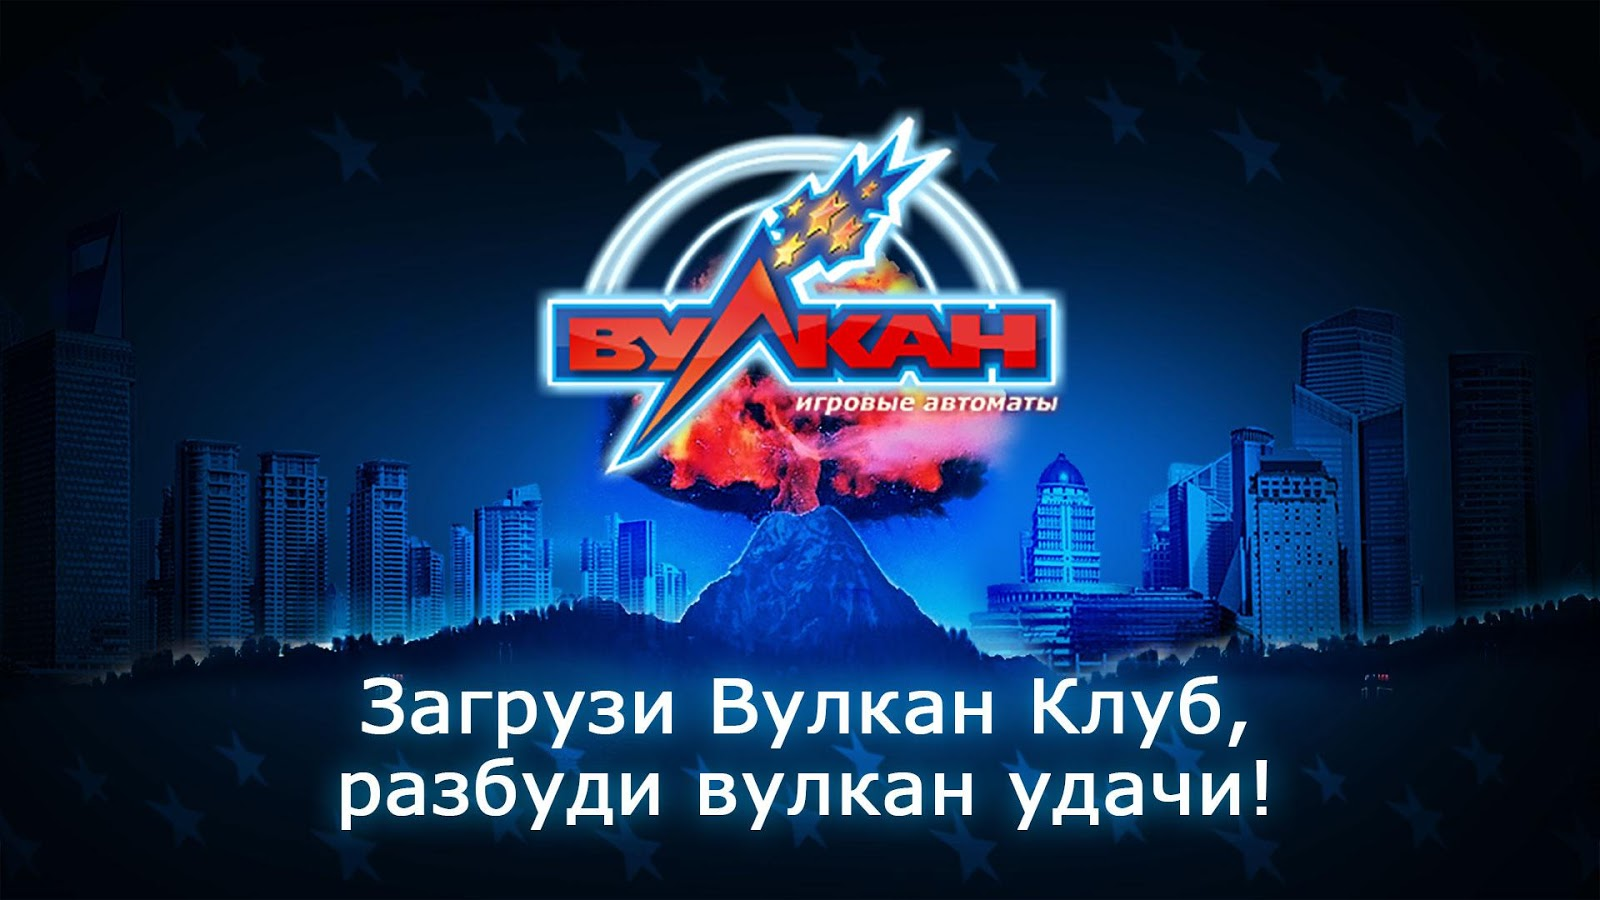 Казино онлайн вулкан зеркало европейское онлайн казино